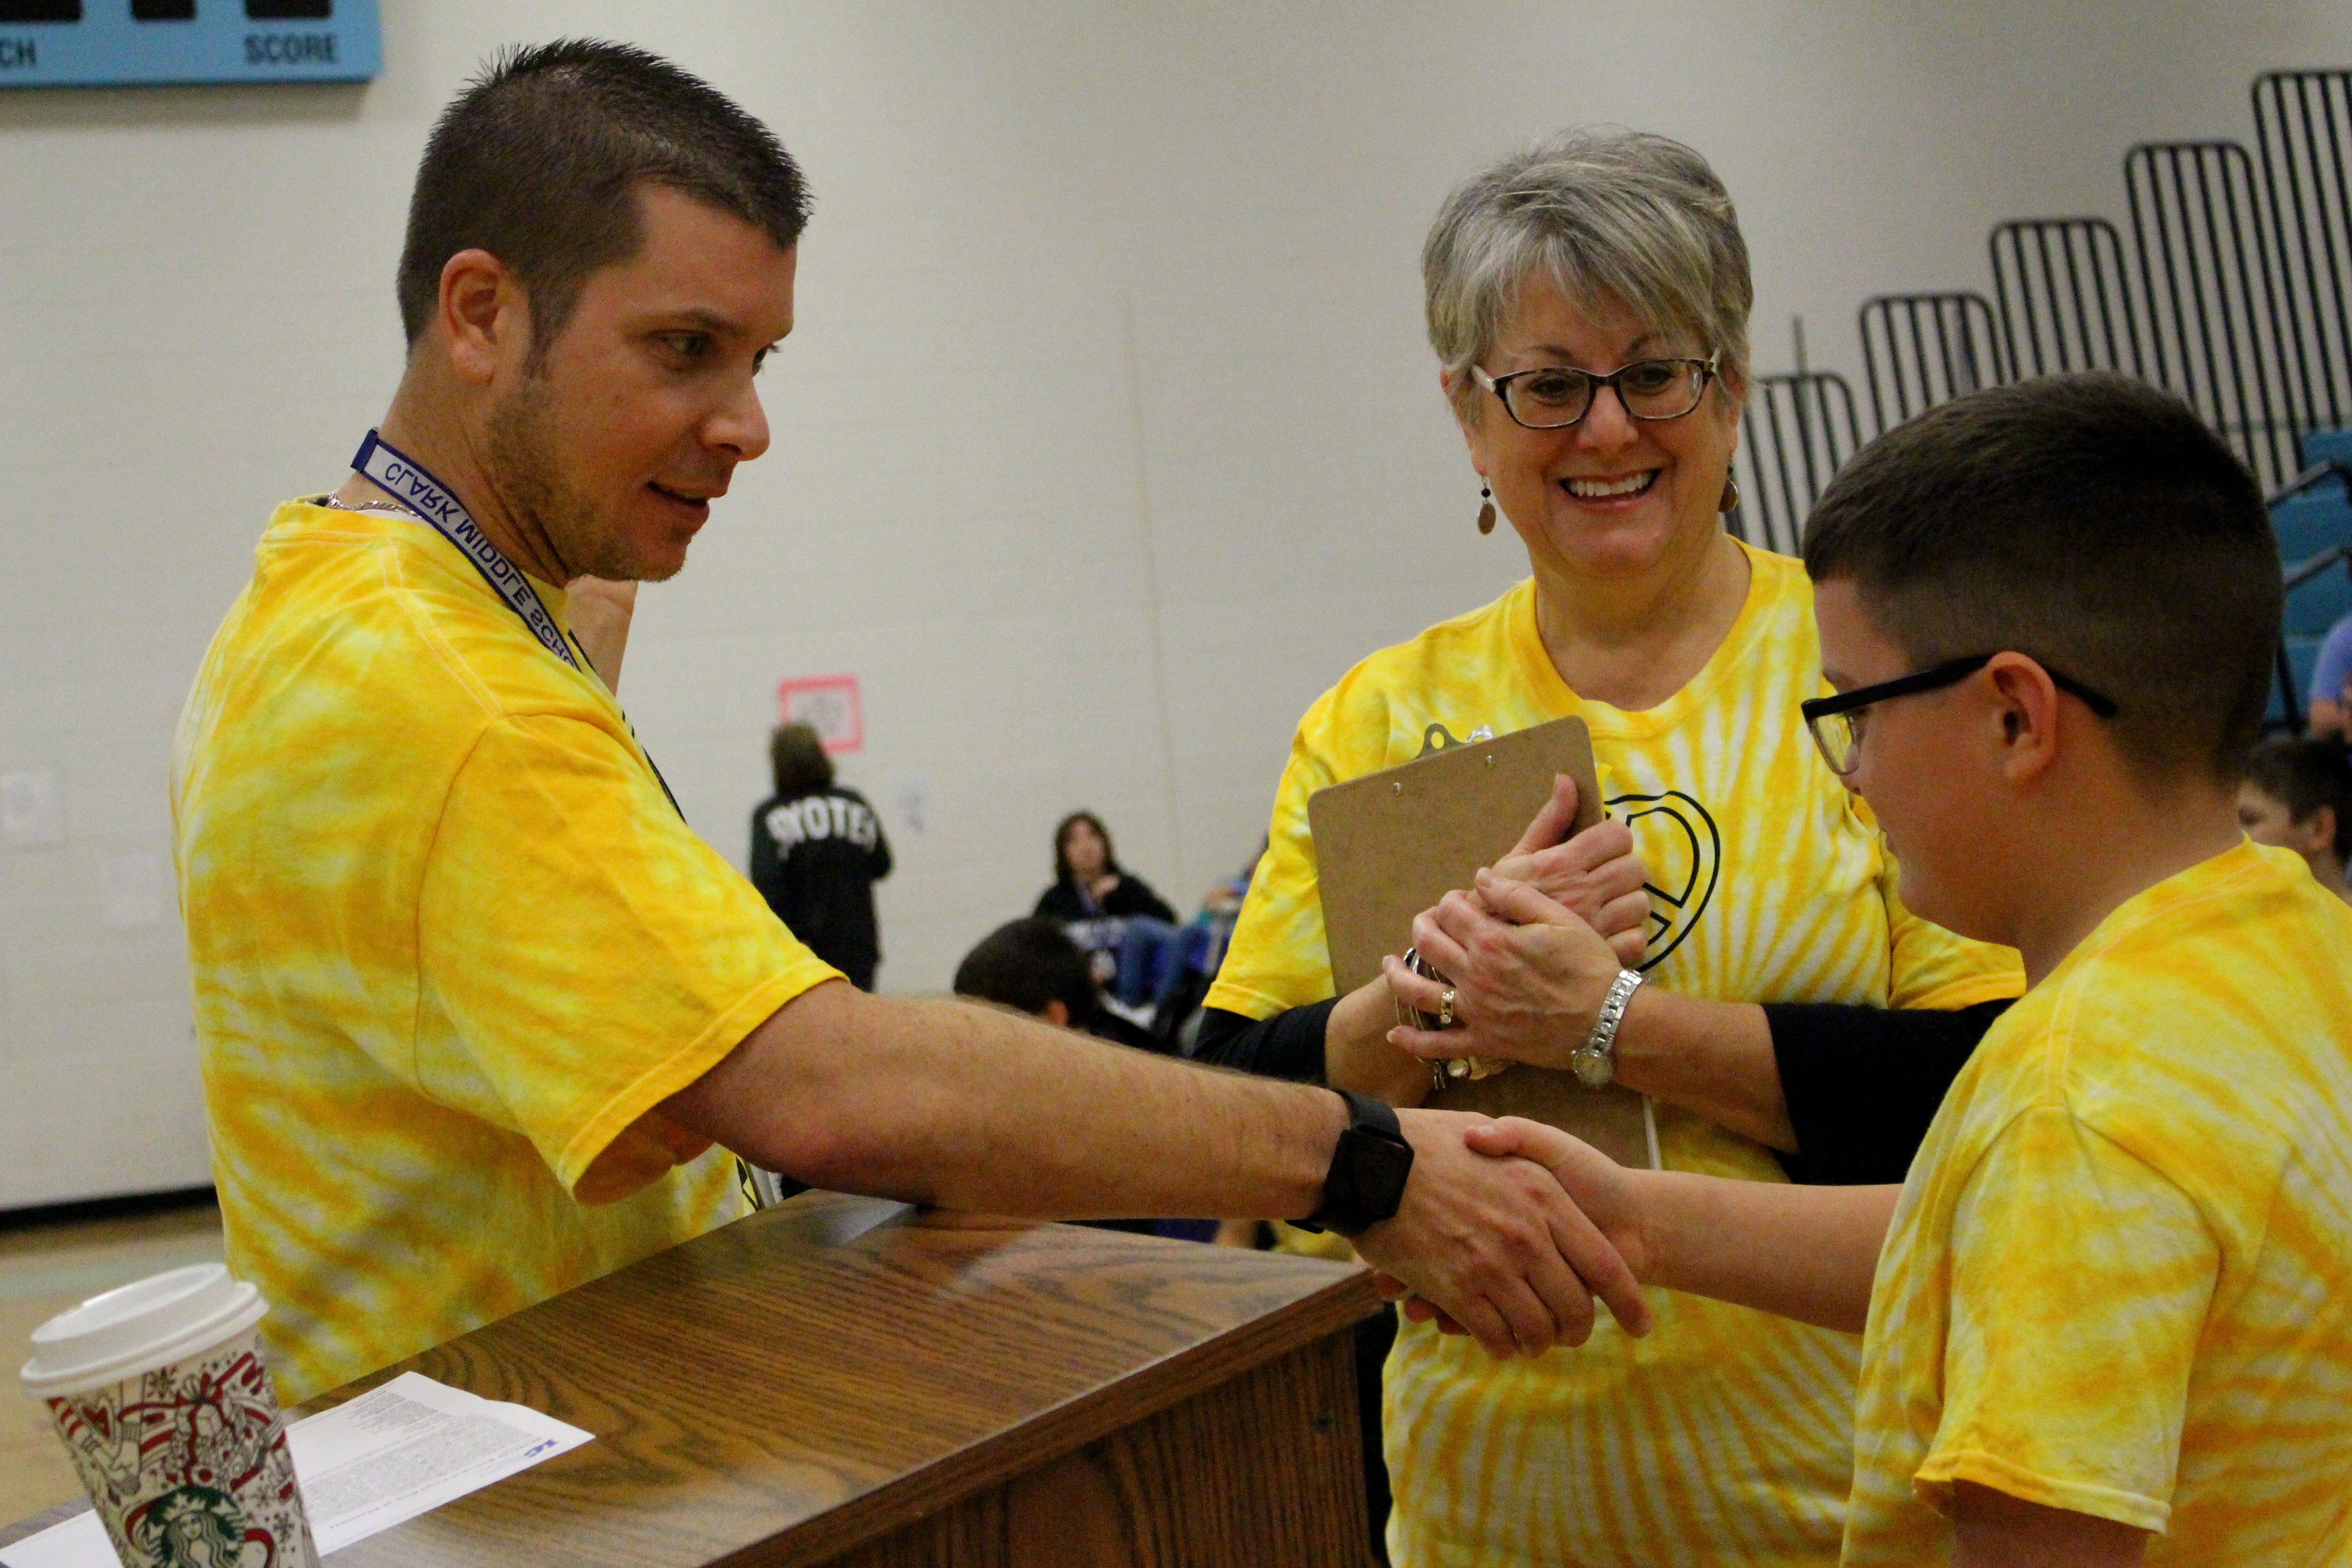 Stanicz shakes student's hand